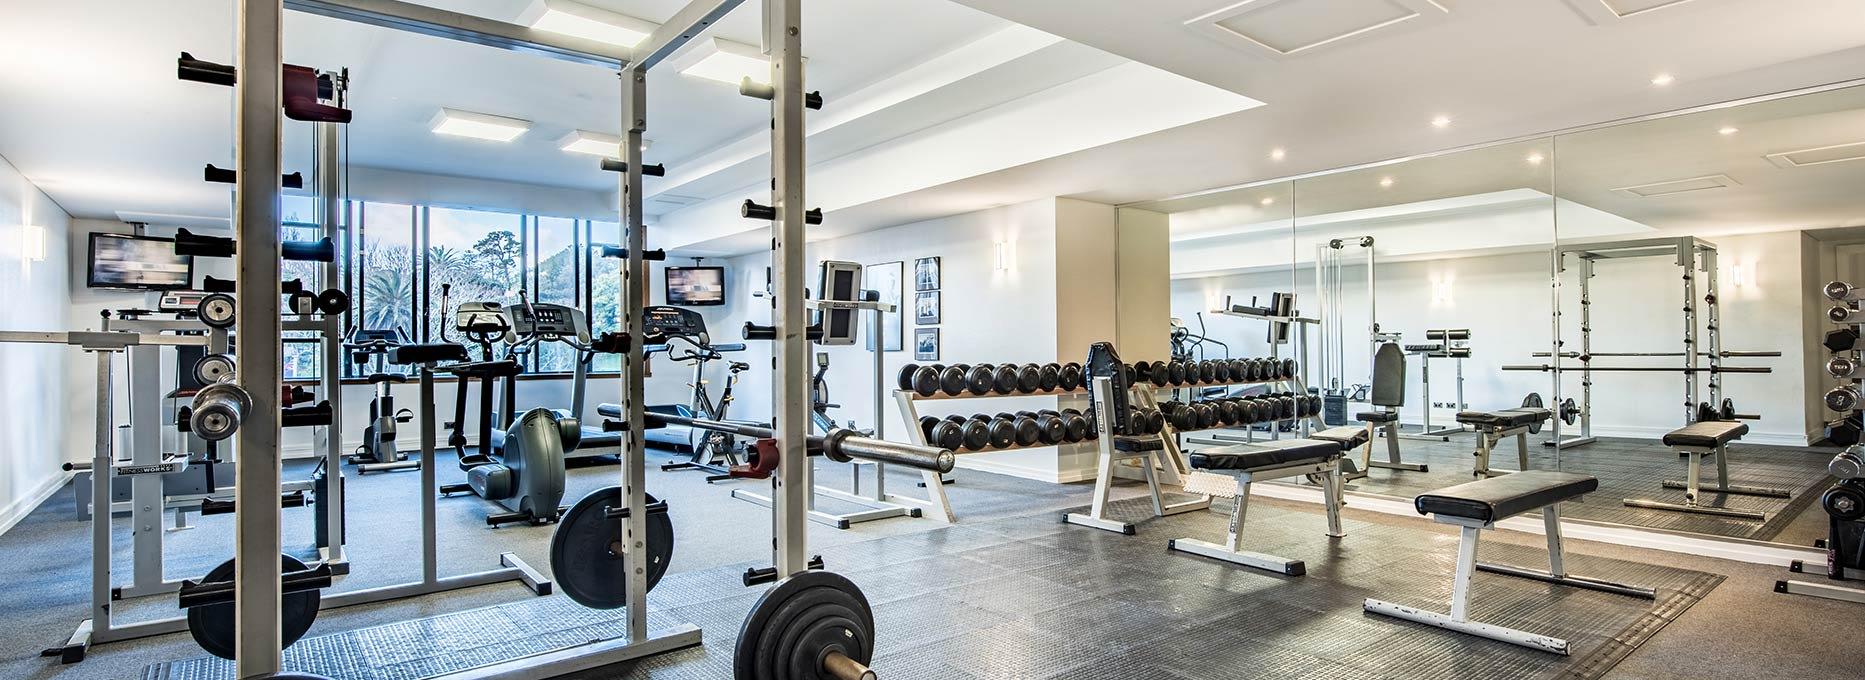 Avani Metropolis Residences Gym